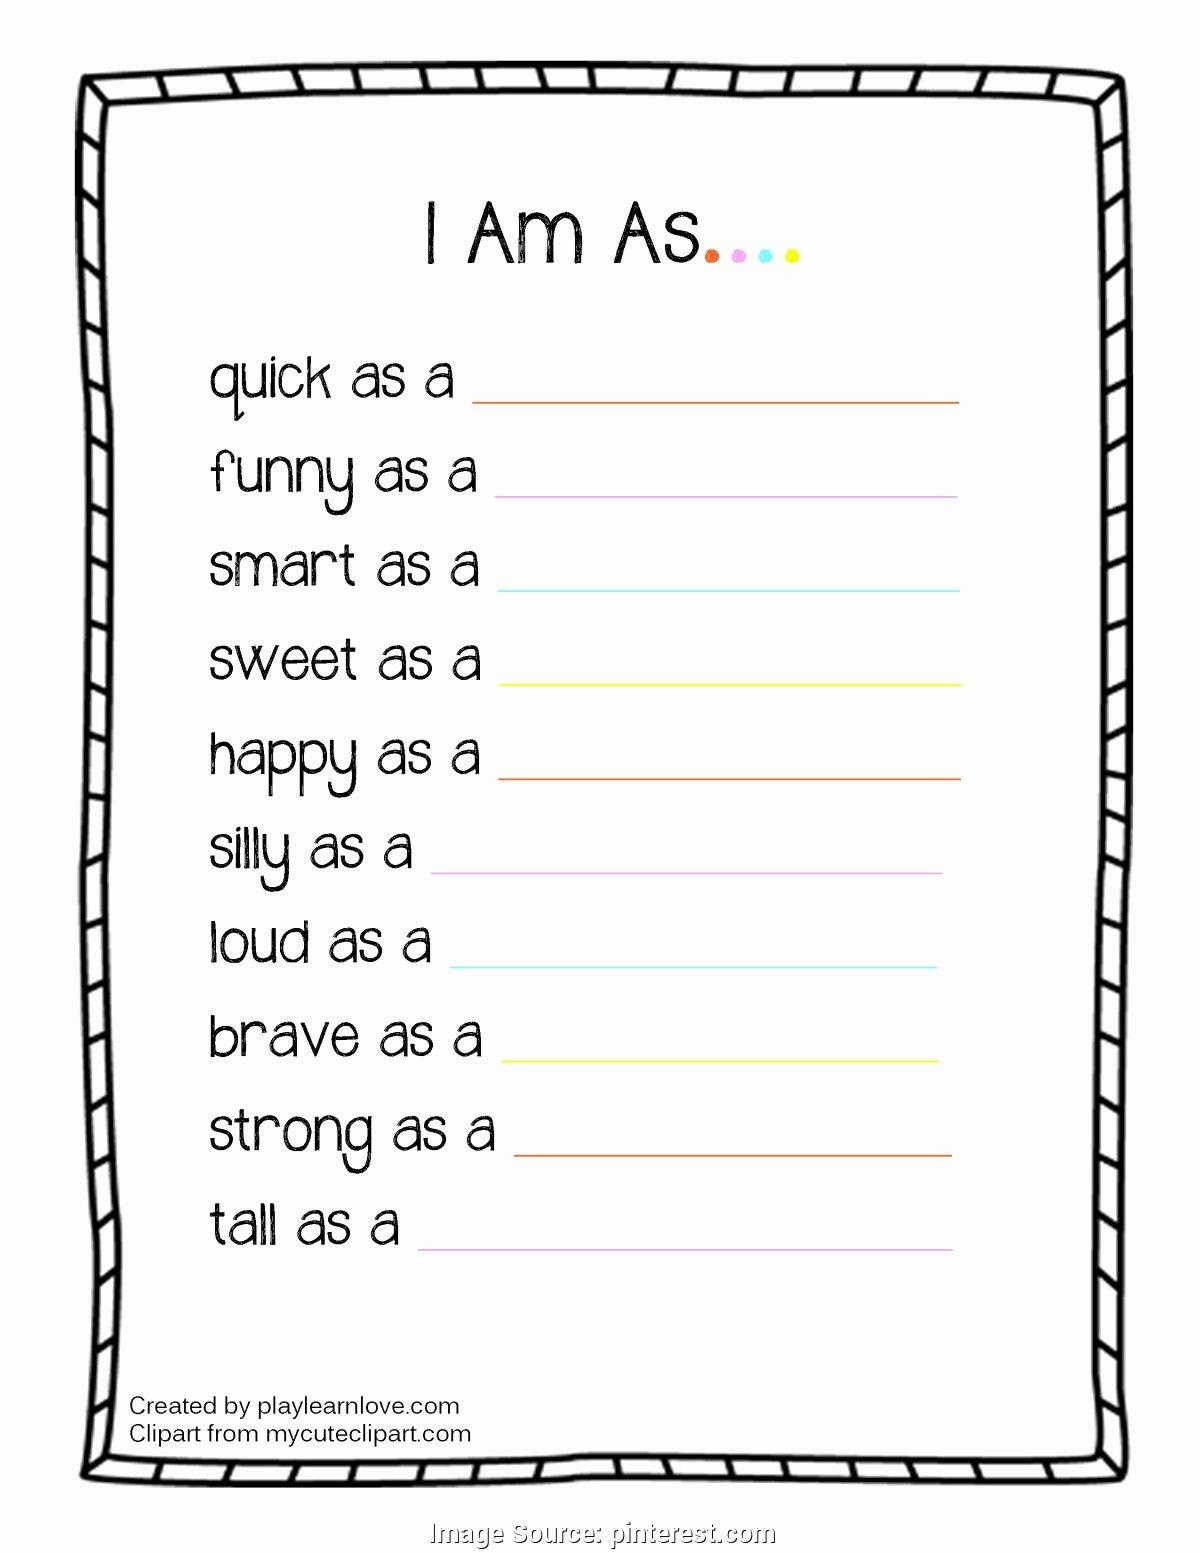 49 All About Me Worksheet Preschool